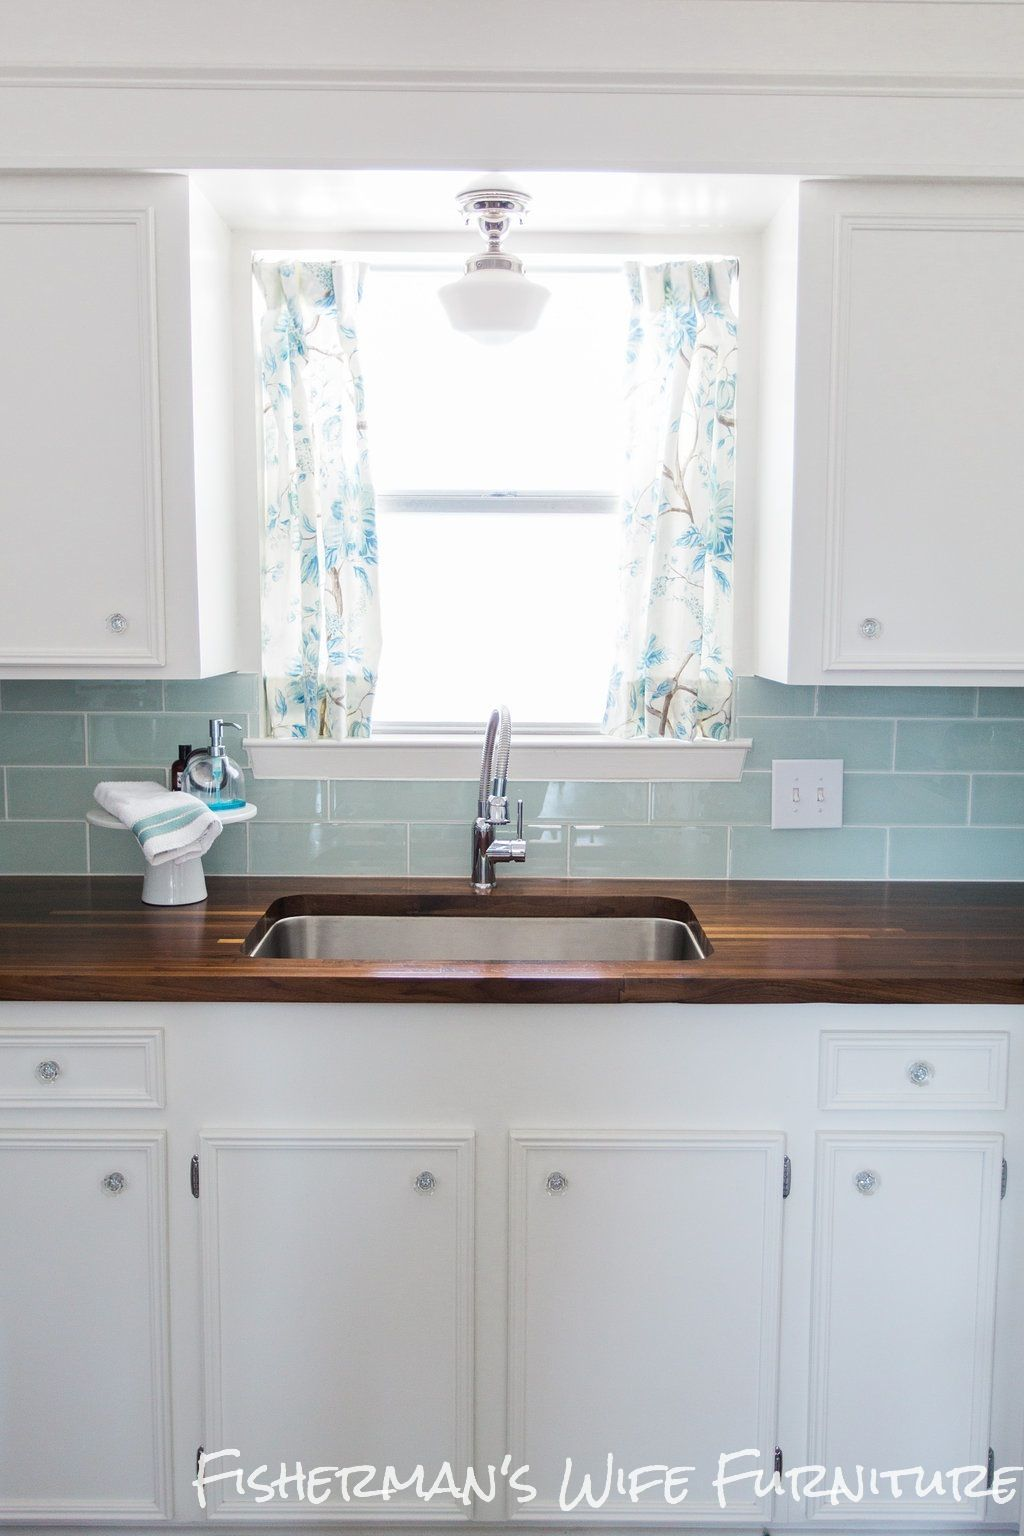 Dark butcher block glass tile backsplash fisherman   wife furniture diy kitchen reveal update also